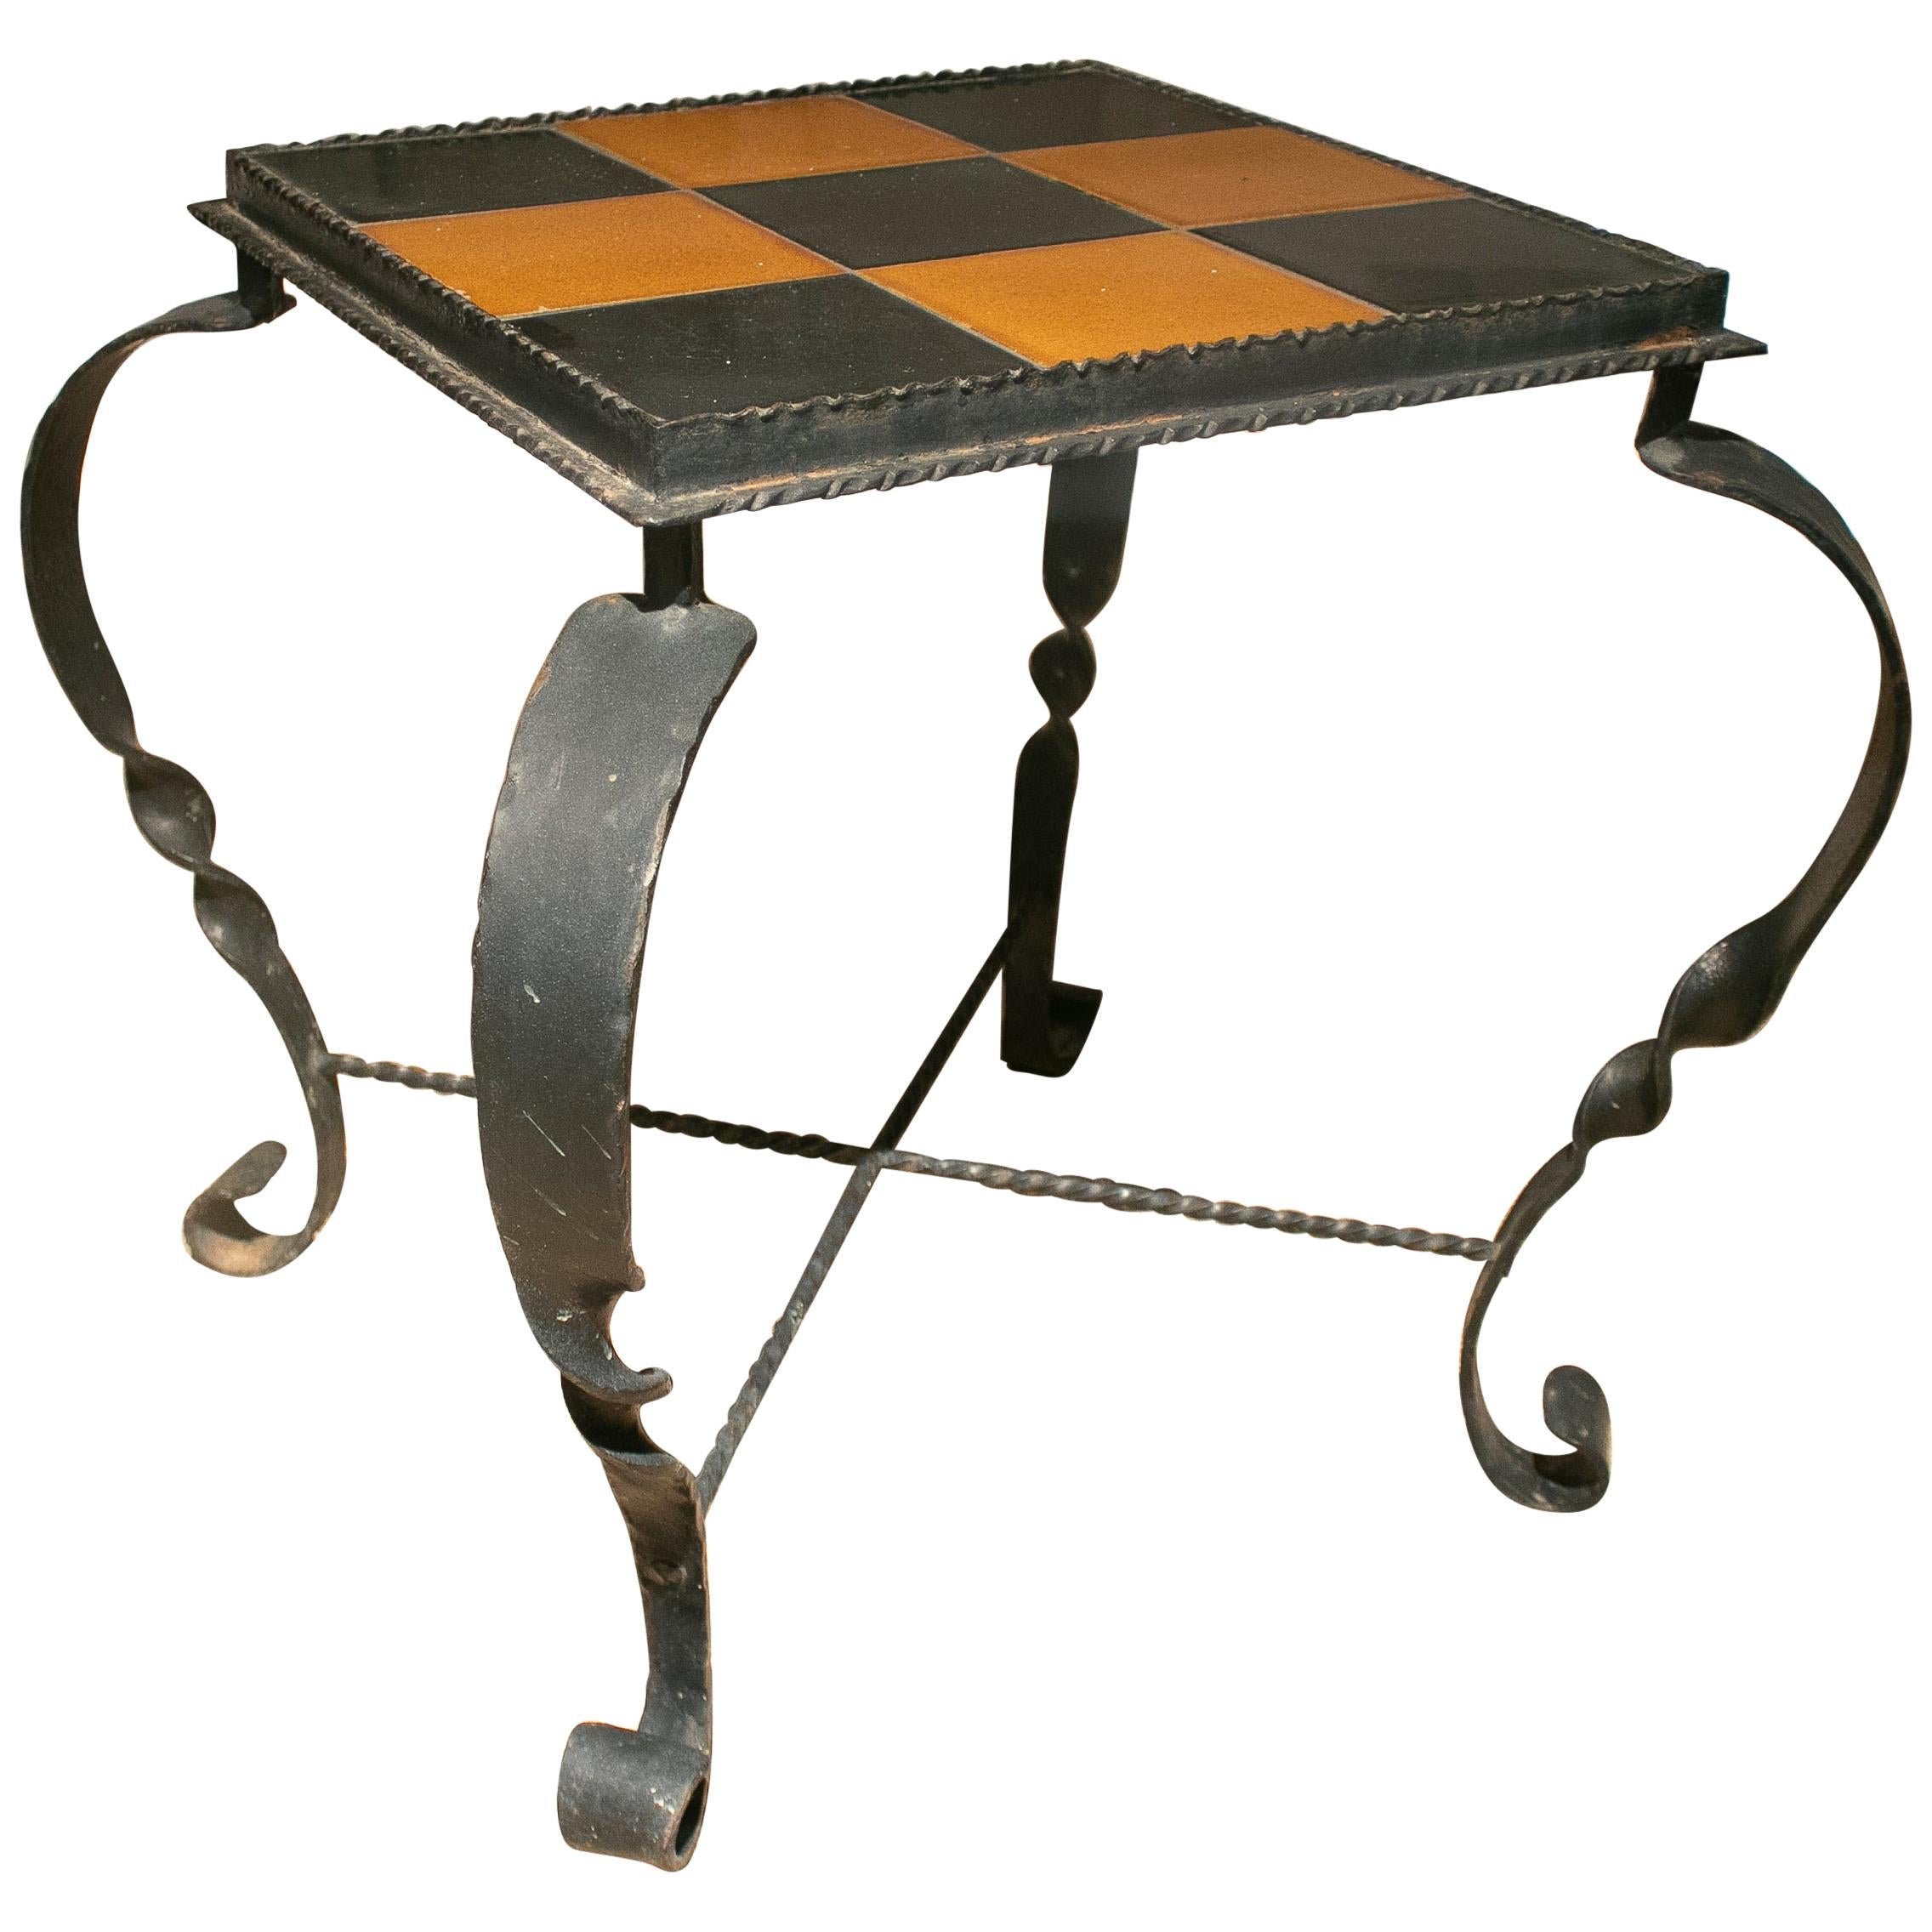 1970s Spanish Iron Garden Table w/ Checkered Glazed Ceramic Tiles Top